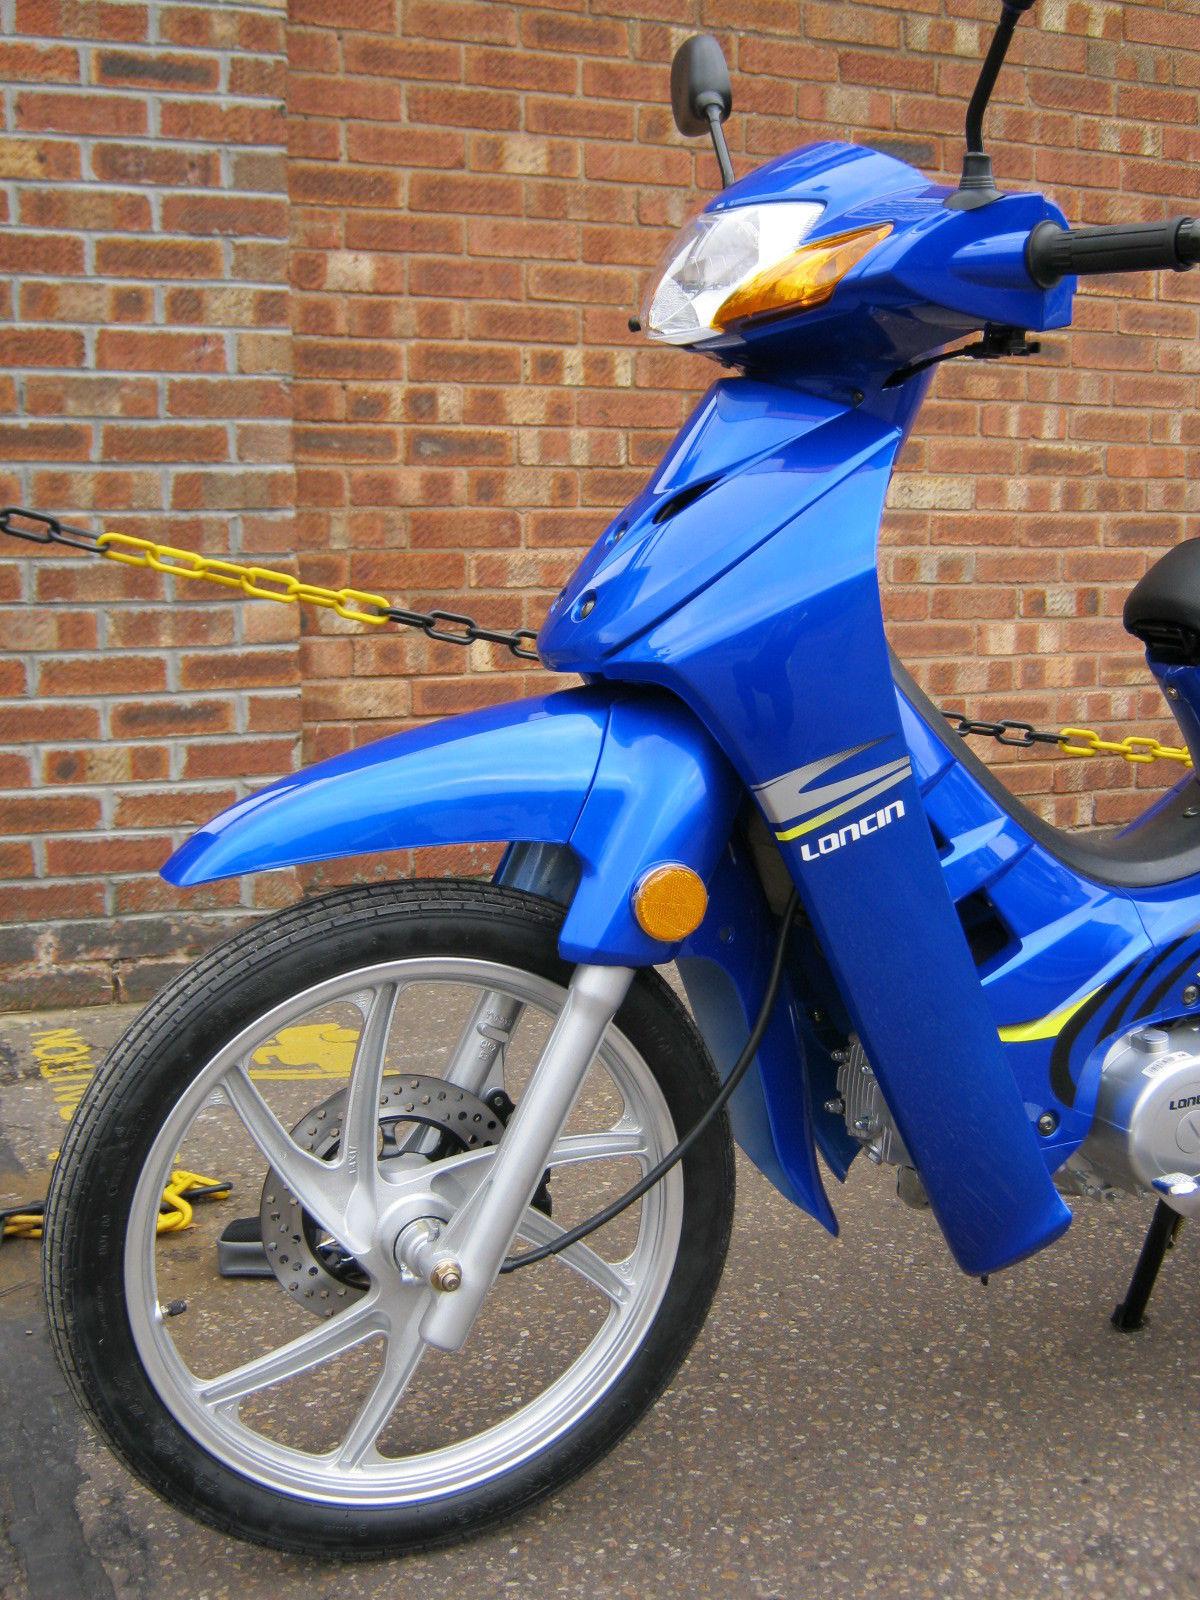 2014 Loncin Blue 110cc 4 Speed Semi Auto Amp Honda Anf 125